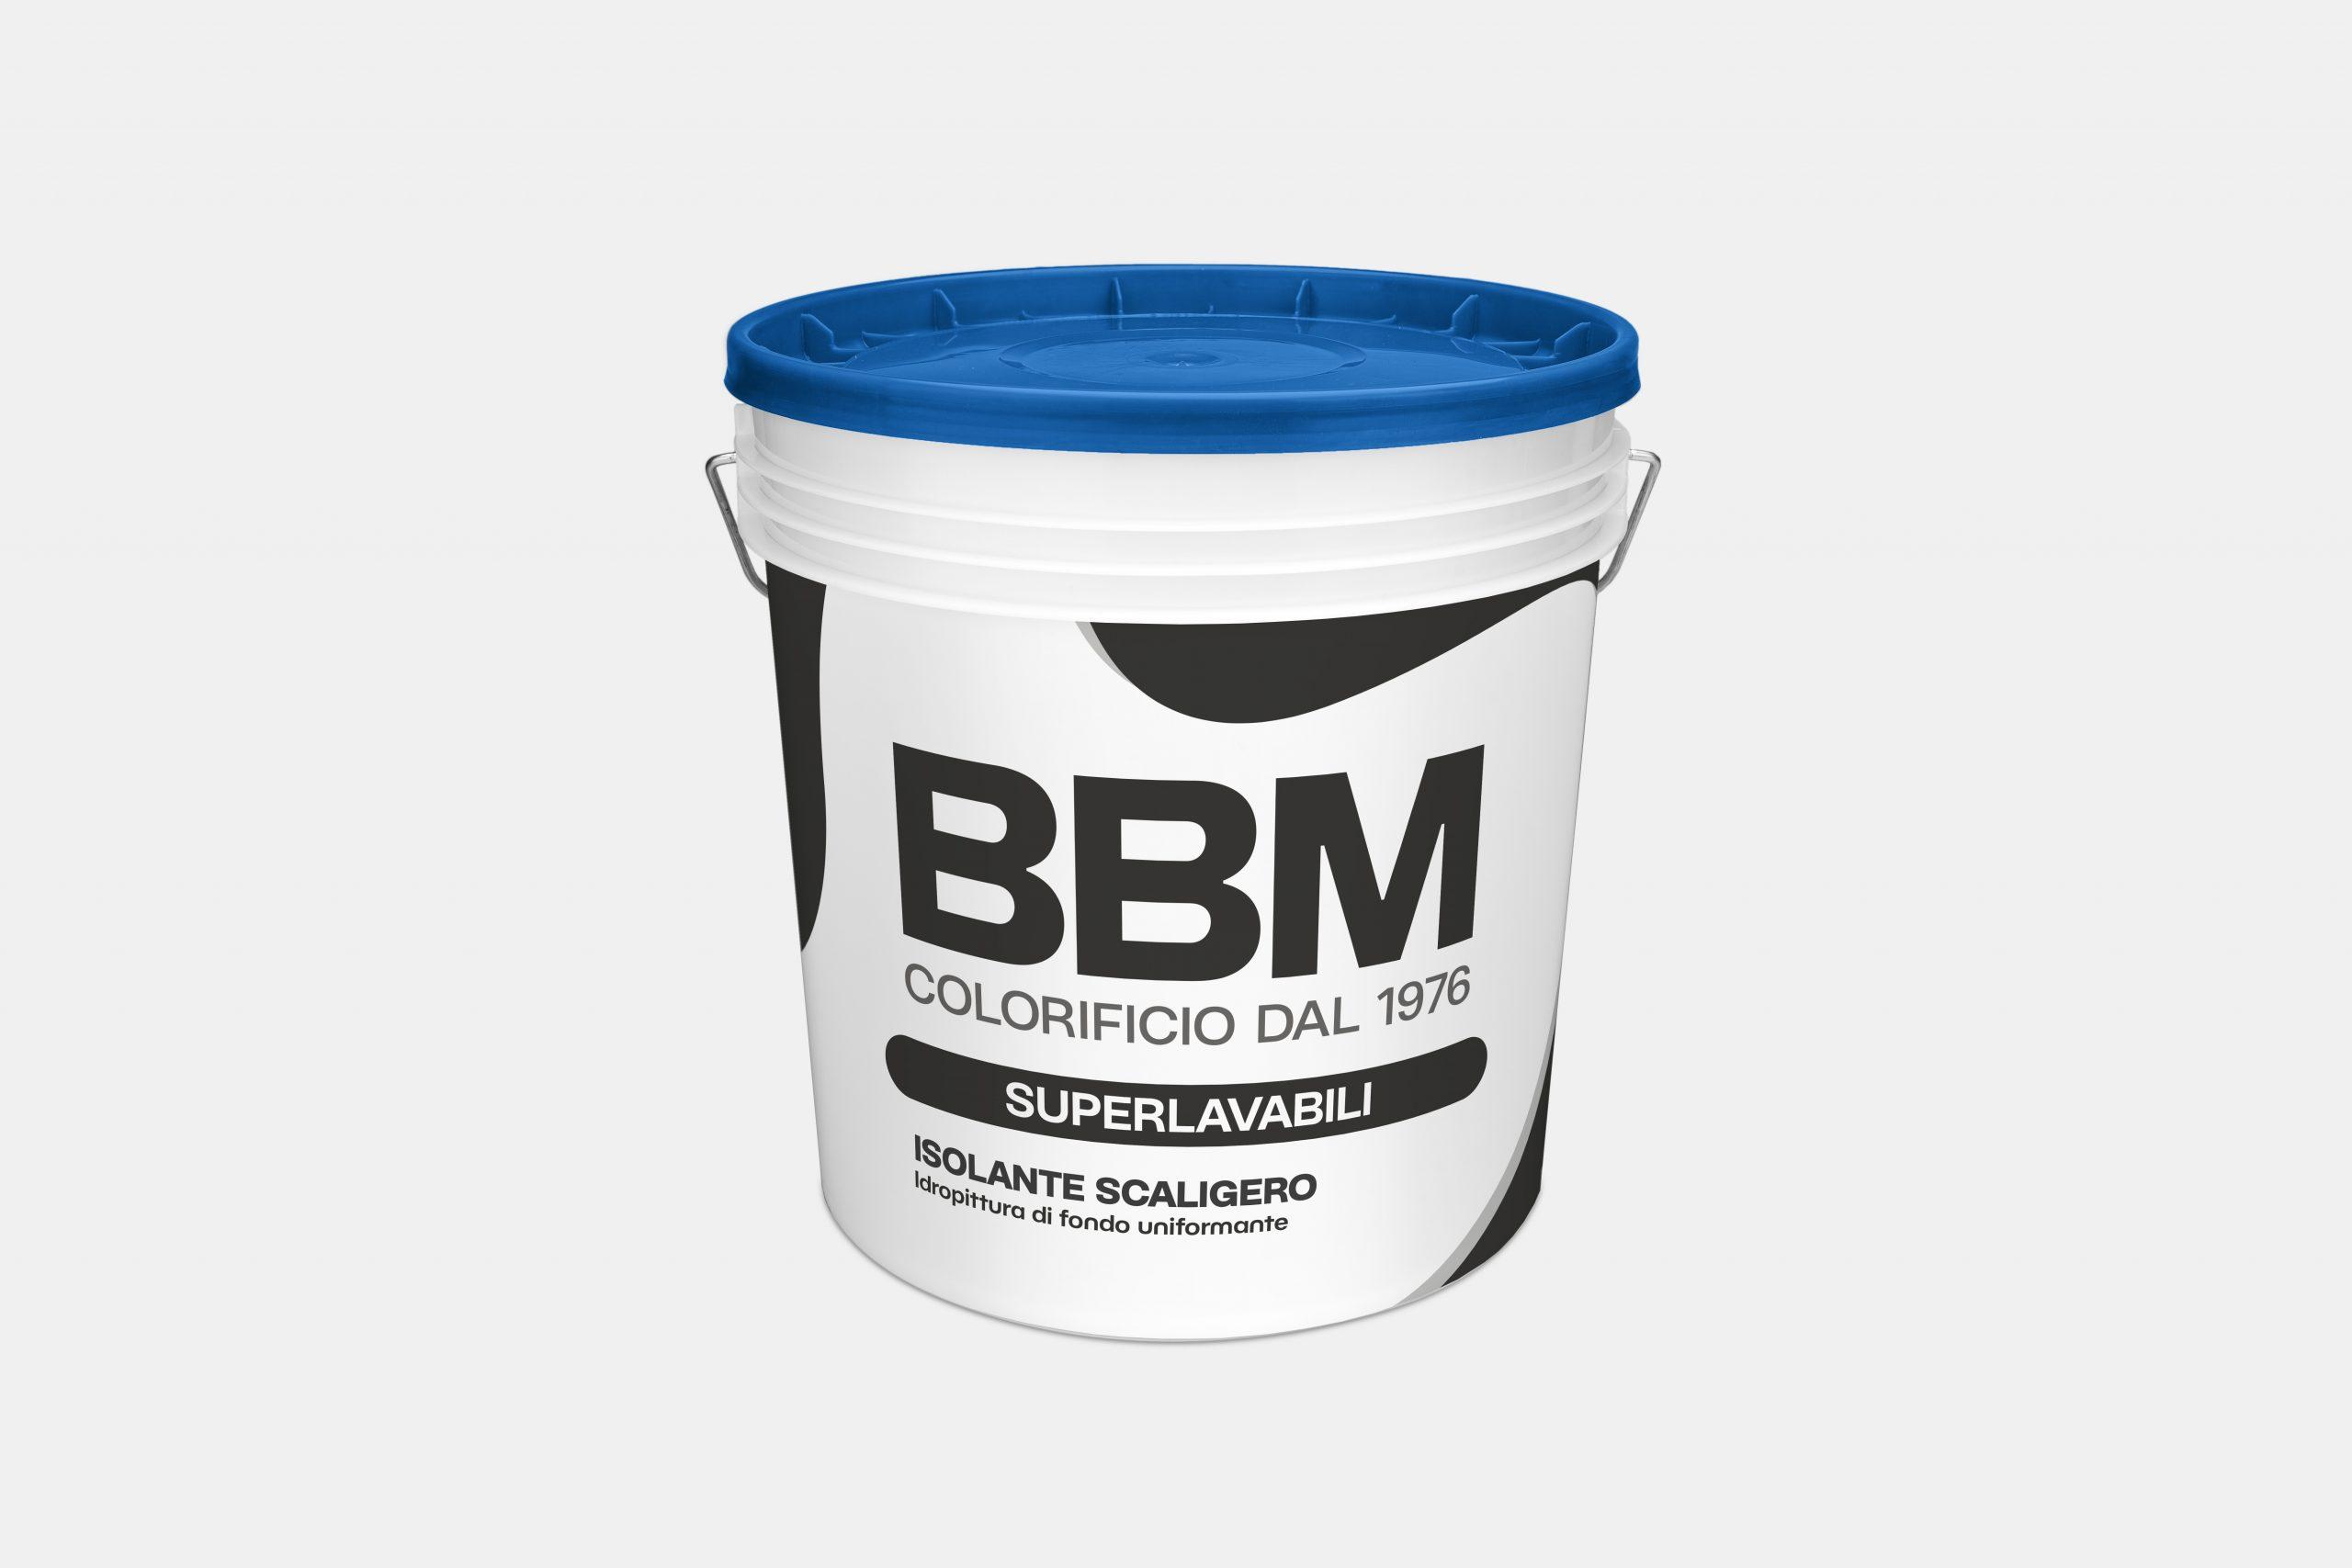 https://bbm-colorificio.it/wp-content/uploads/2021/05/Isolante-scaligero-scaled.jpg